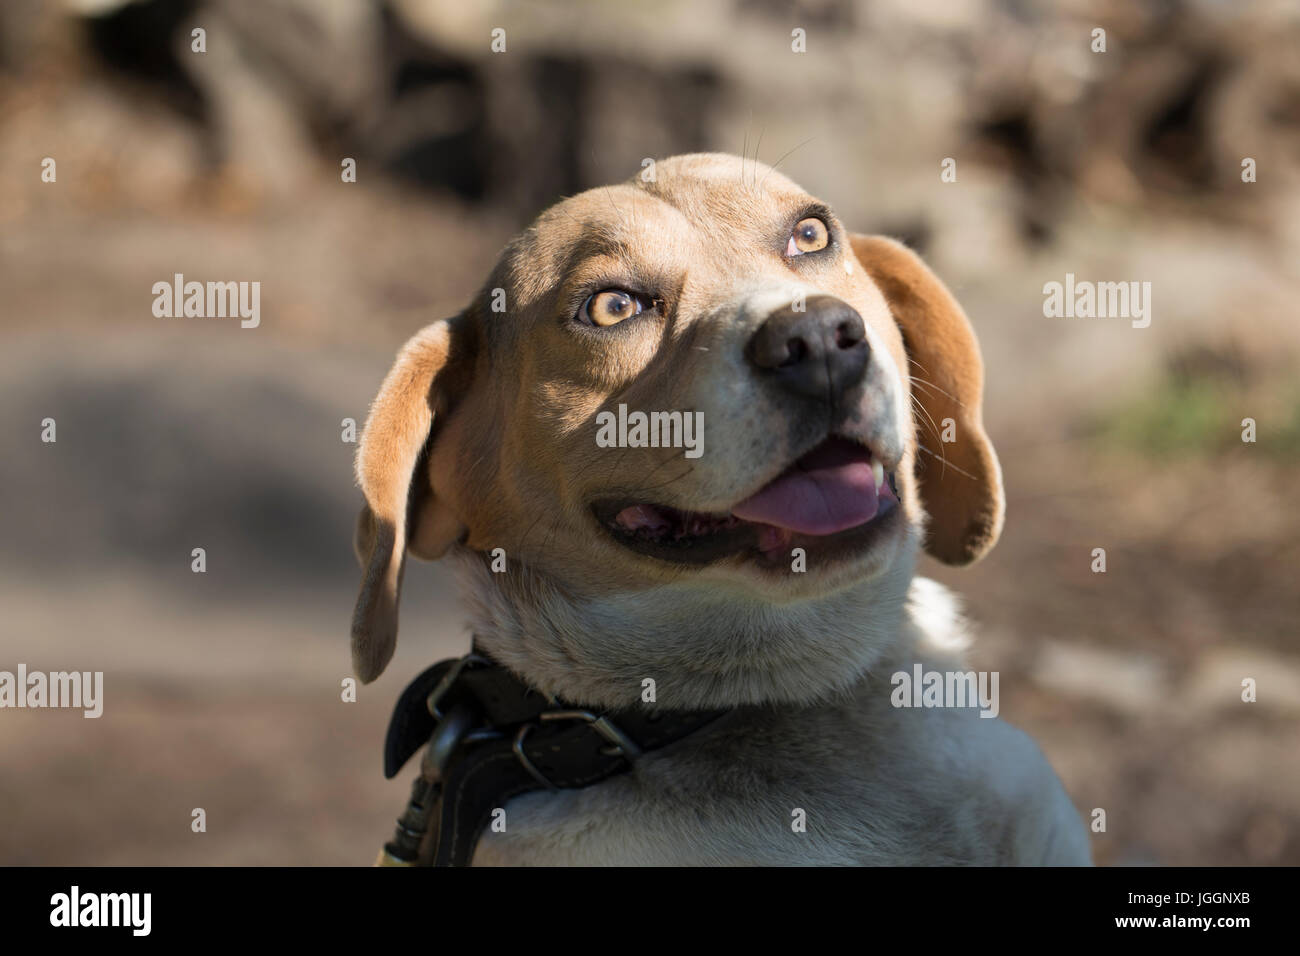 Crossbred dog - Stock Image